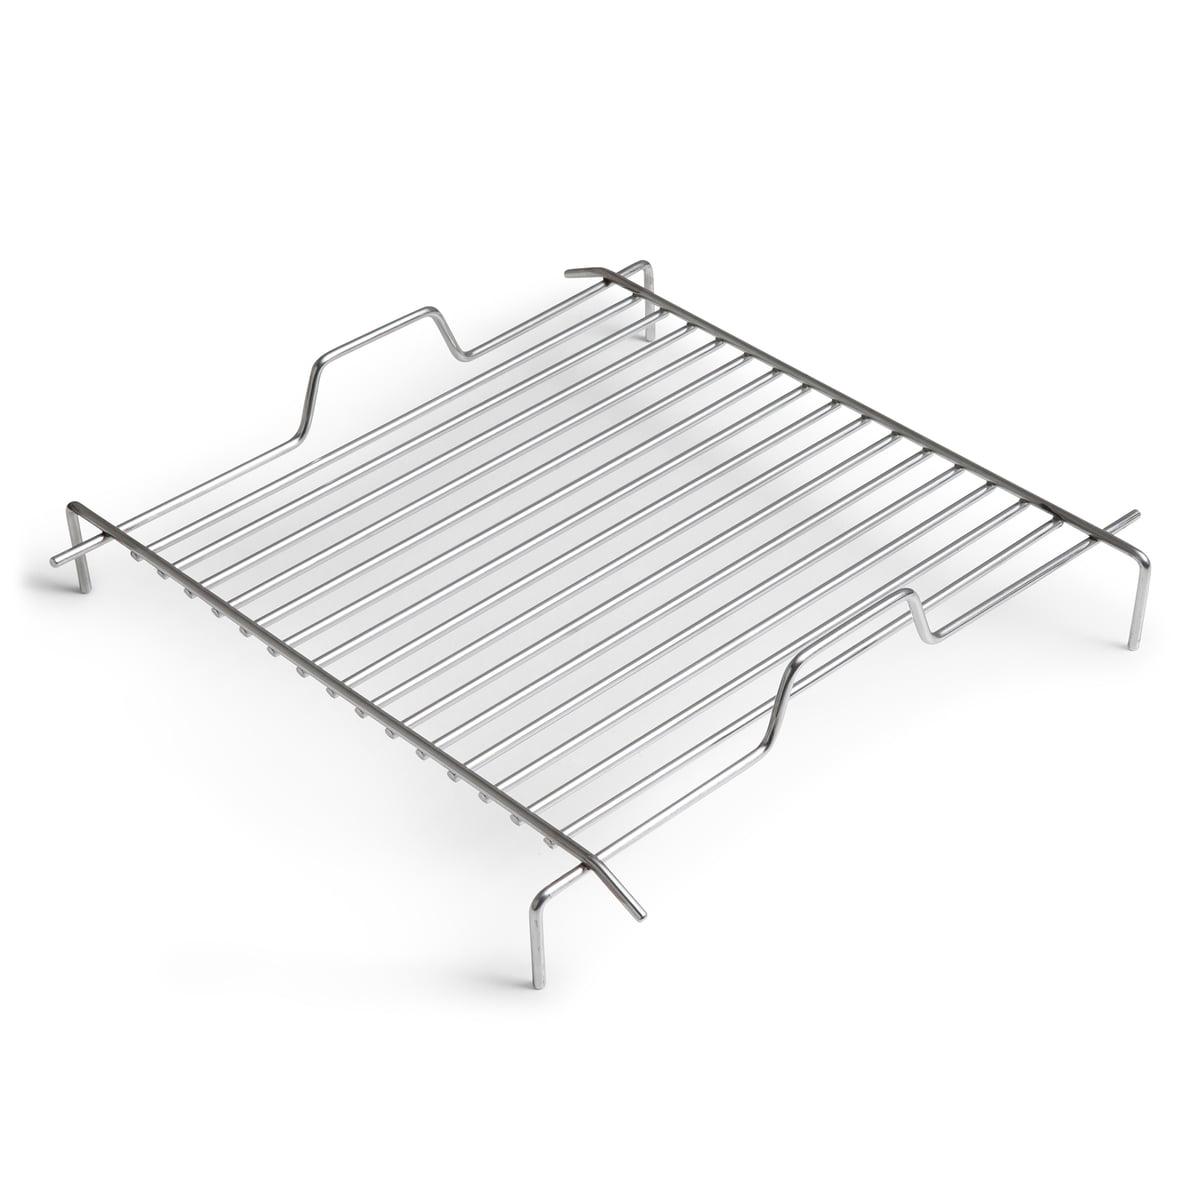 höfats - Cube Grillrost | Garten > Grill und Zubehör | Schwarz | 6 mm edelstahl rundstab | Höfats